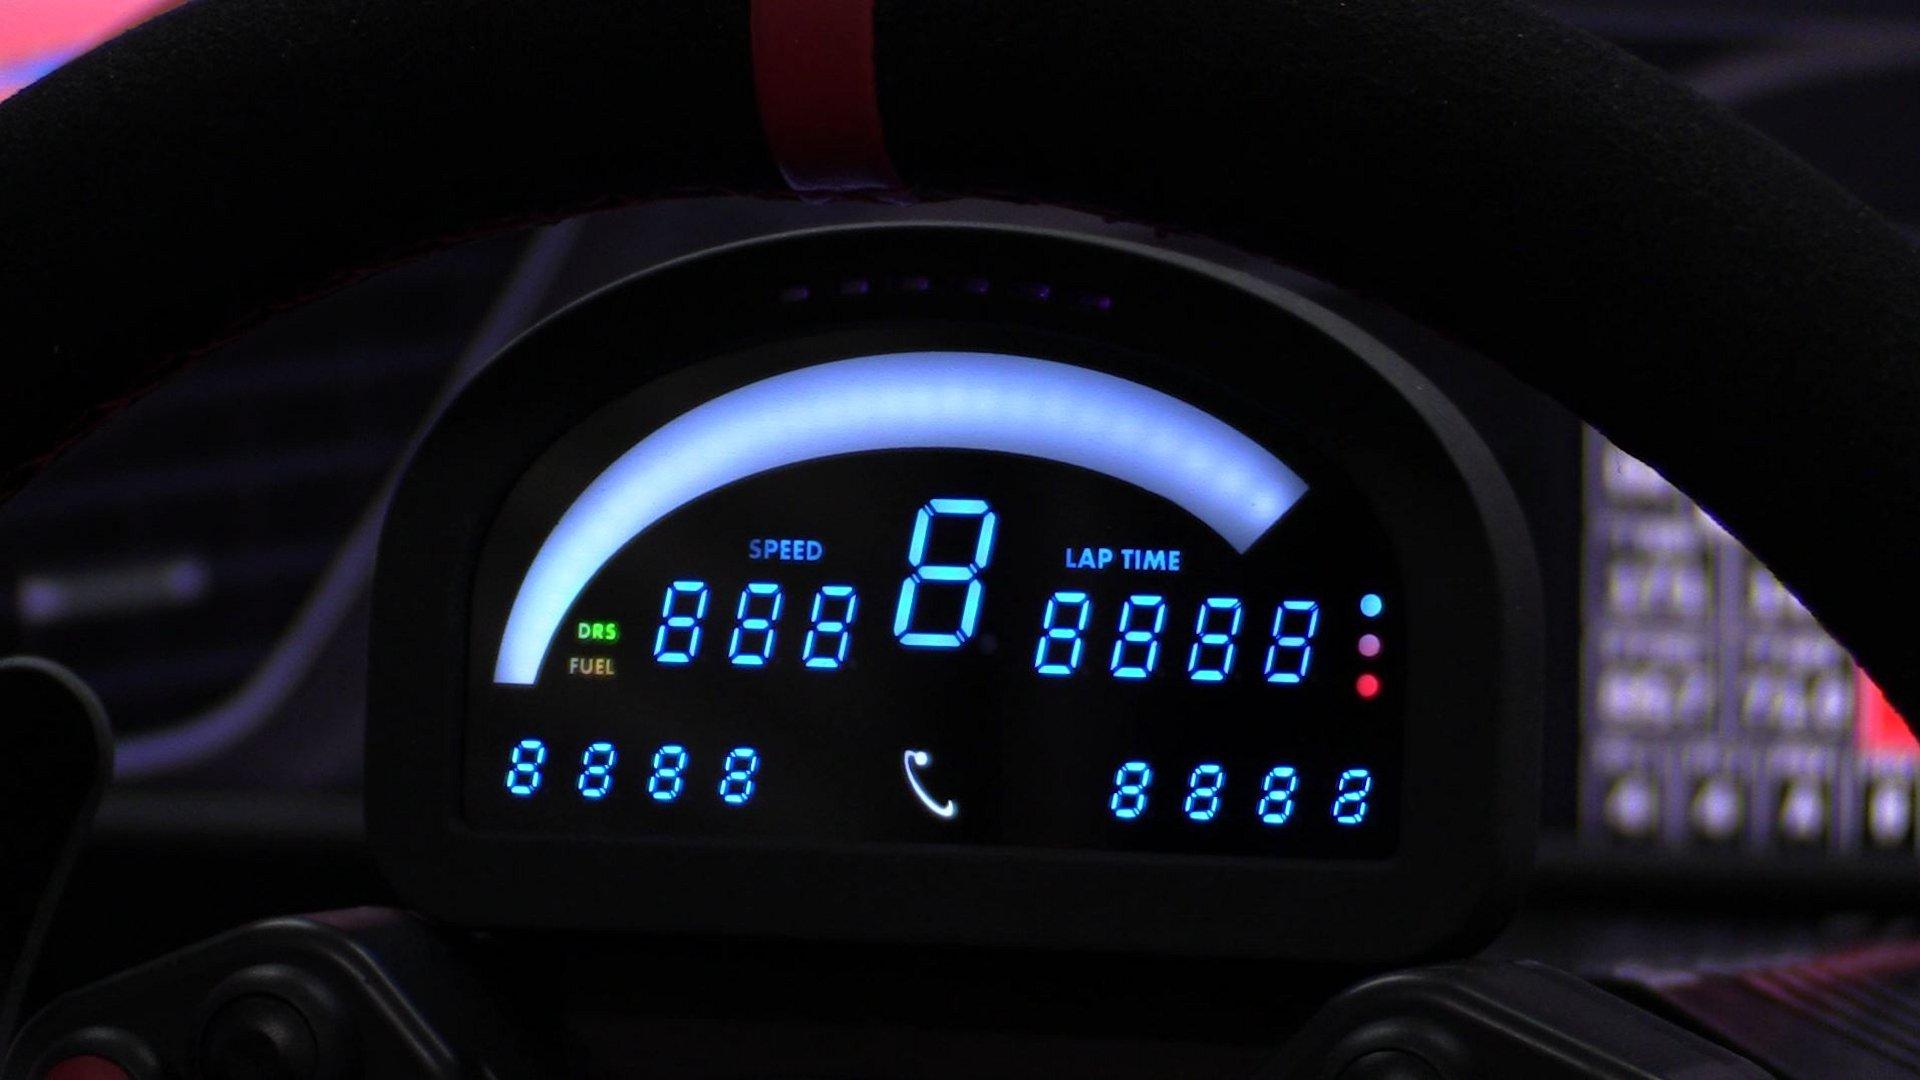 Renovatio SRD-R3 Digital Dash Display Review